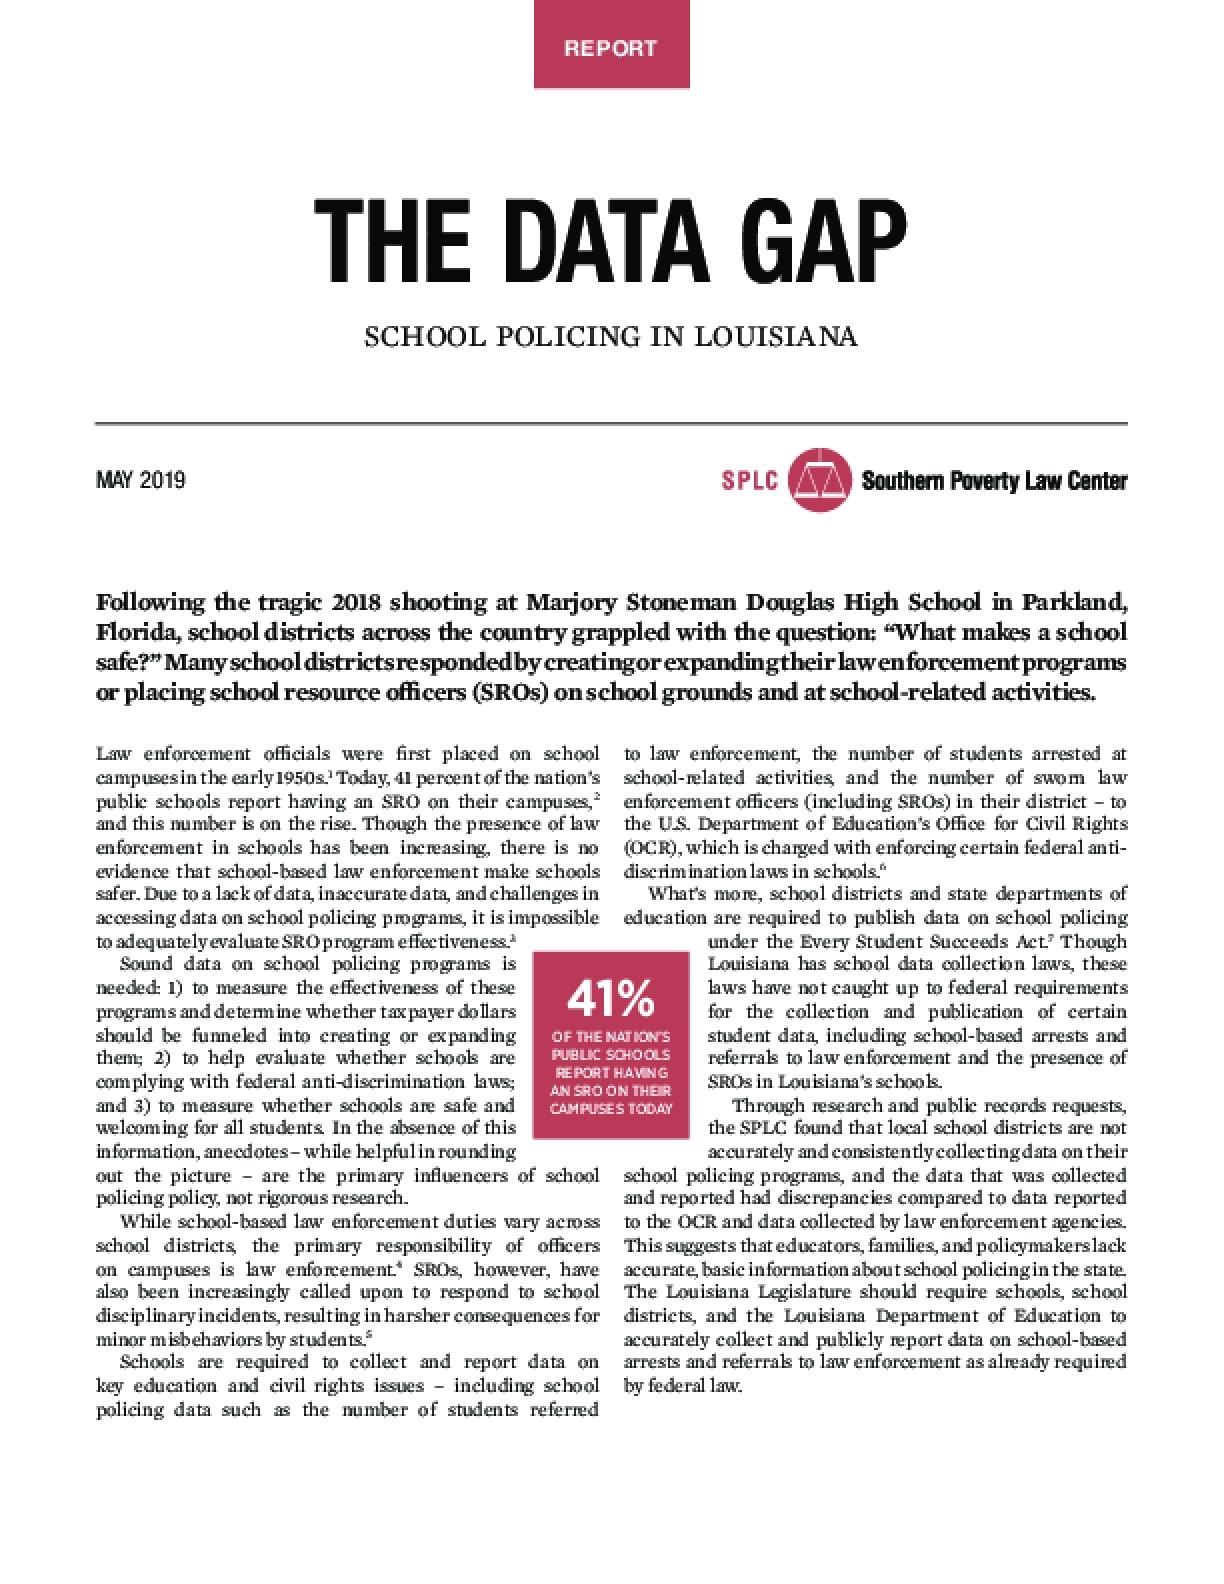 The Data Gap: School Policing In Louisiana